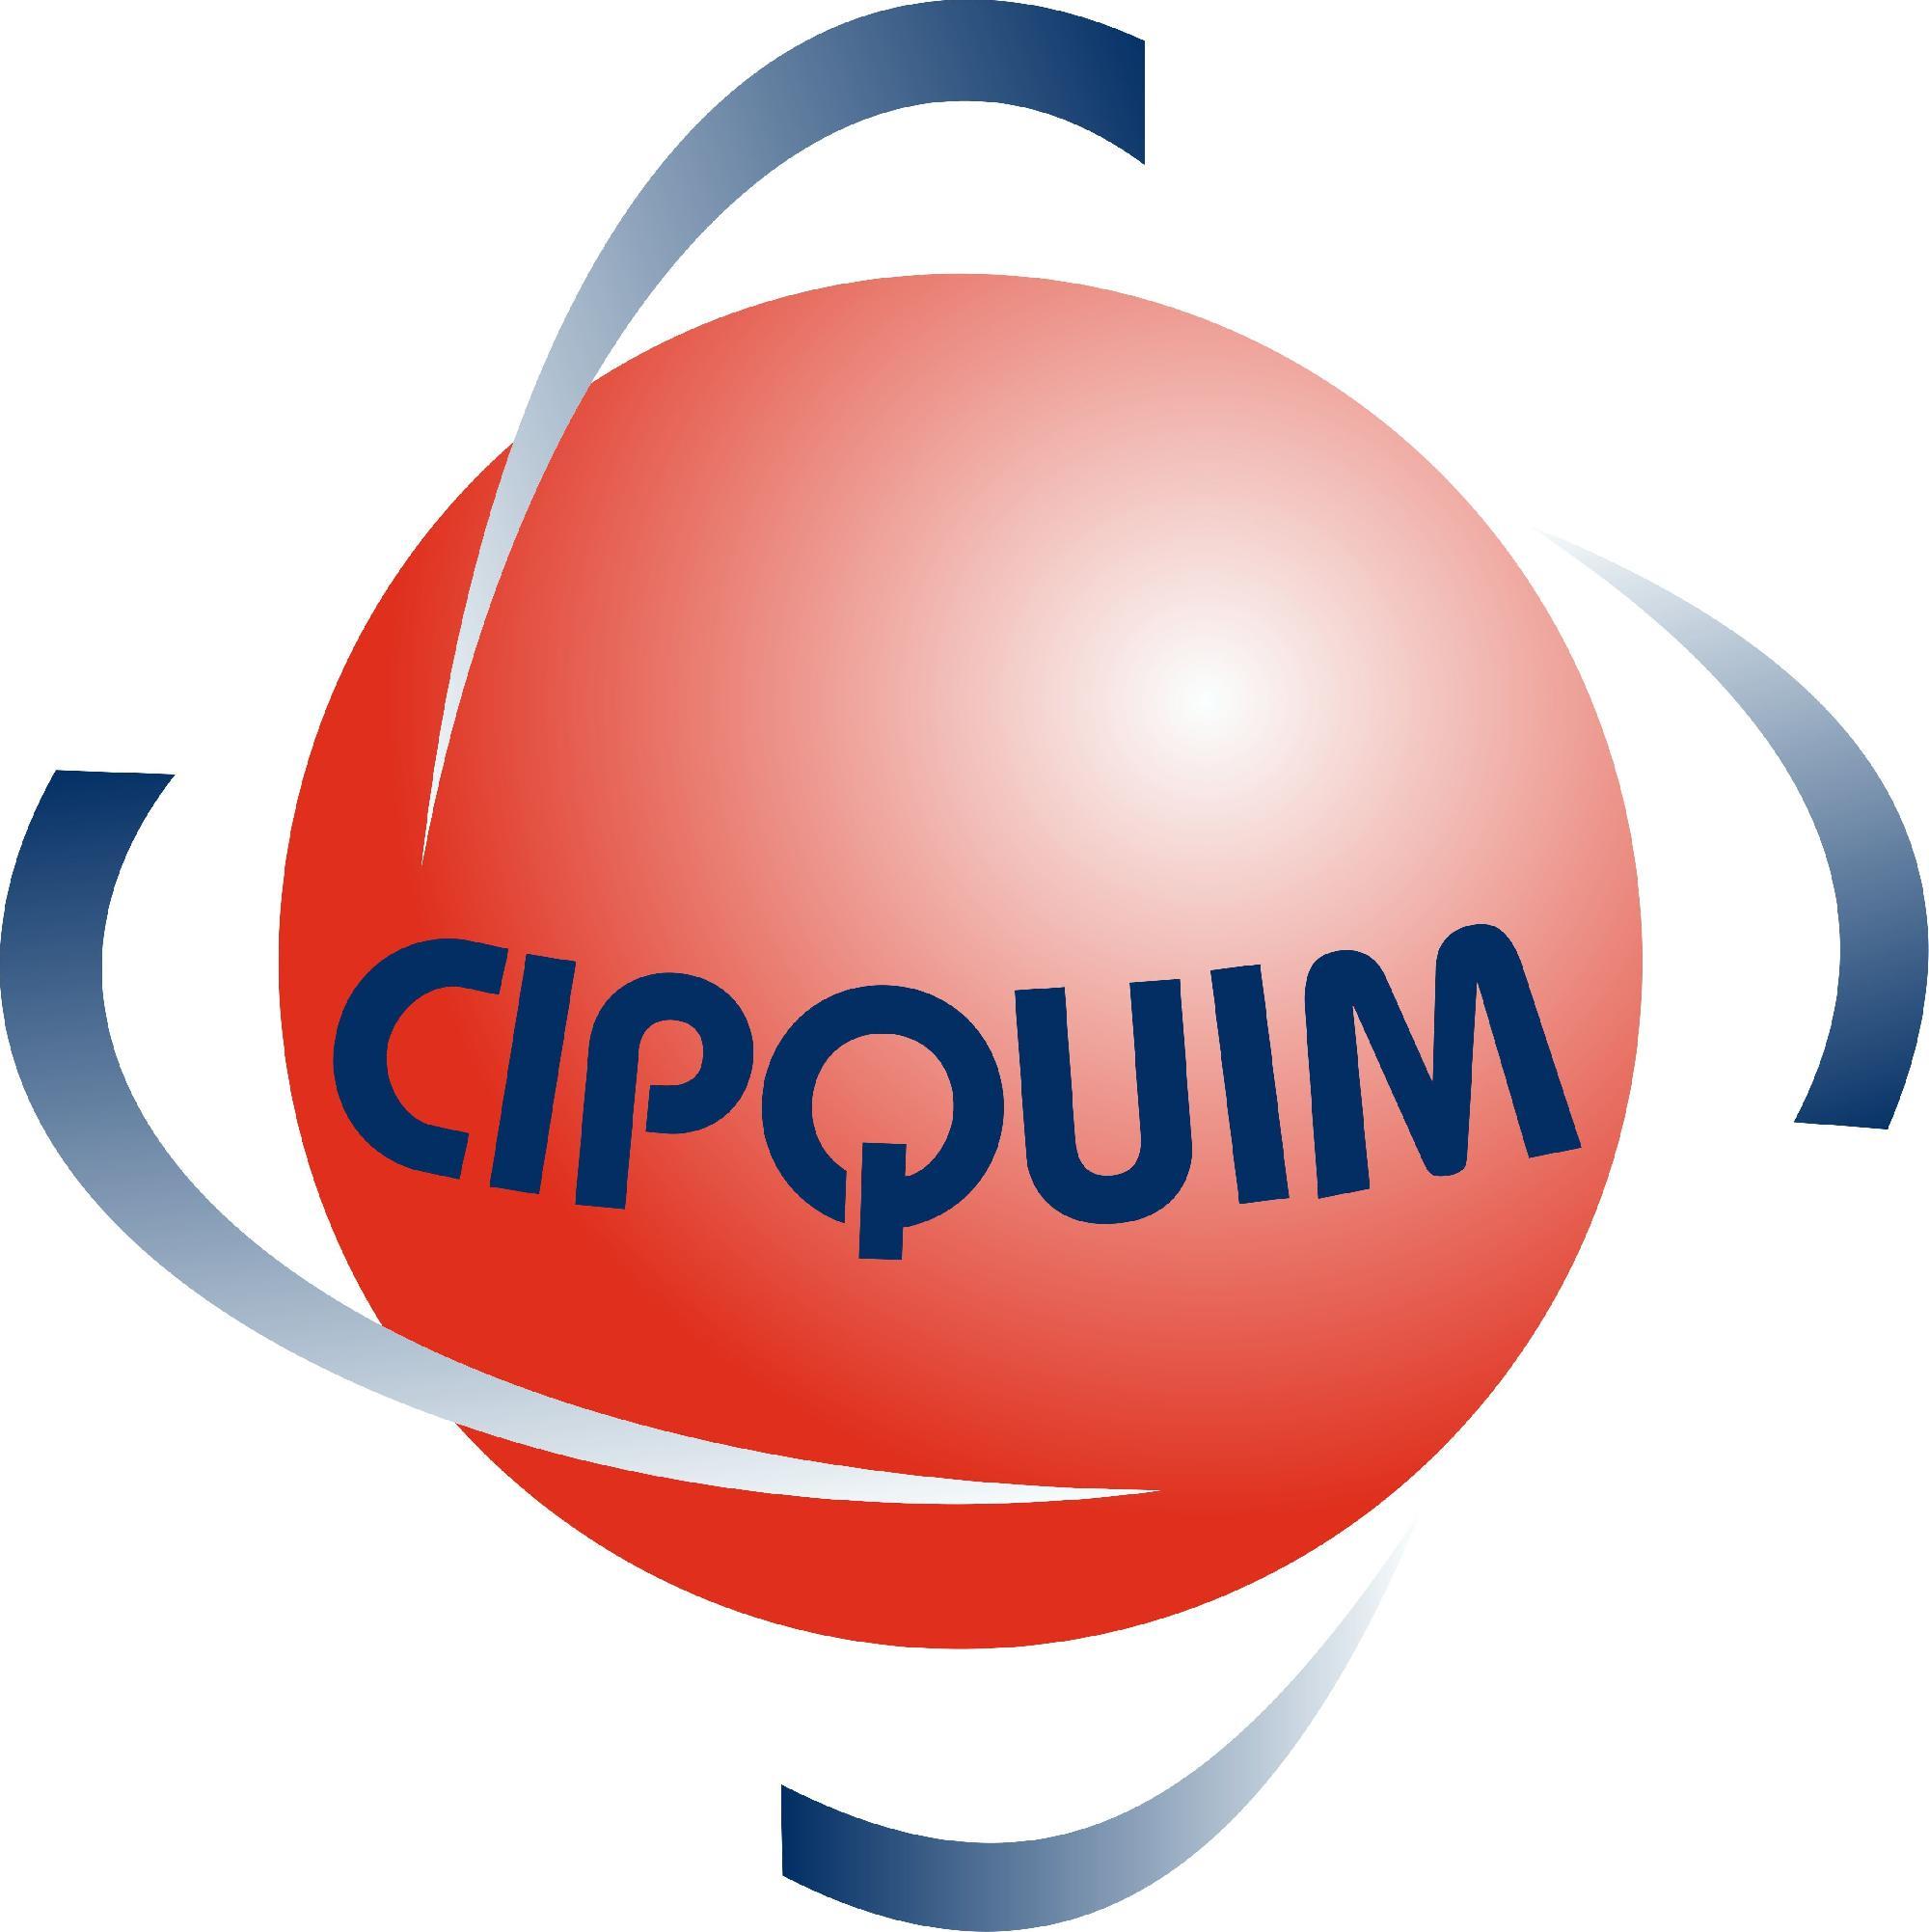 CipQuim_Logo.jpg